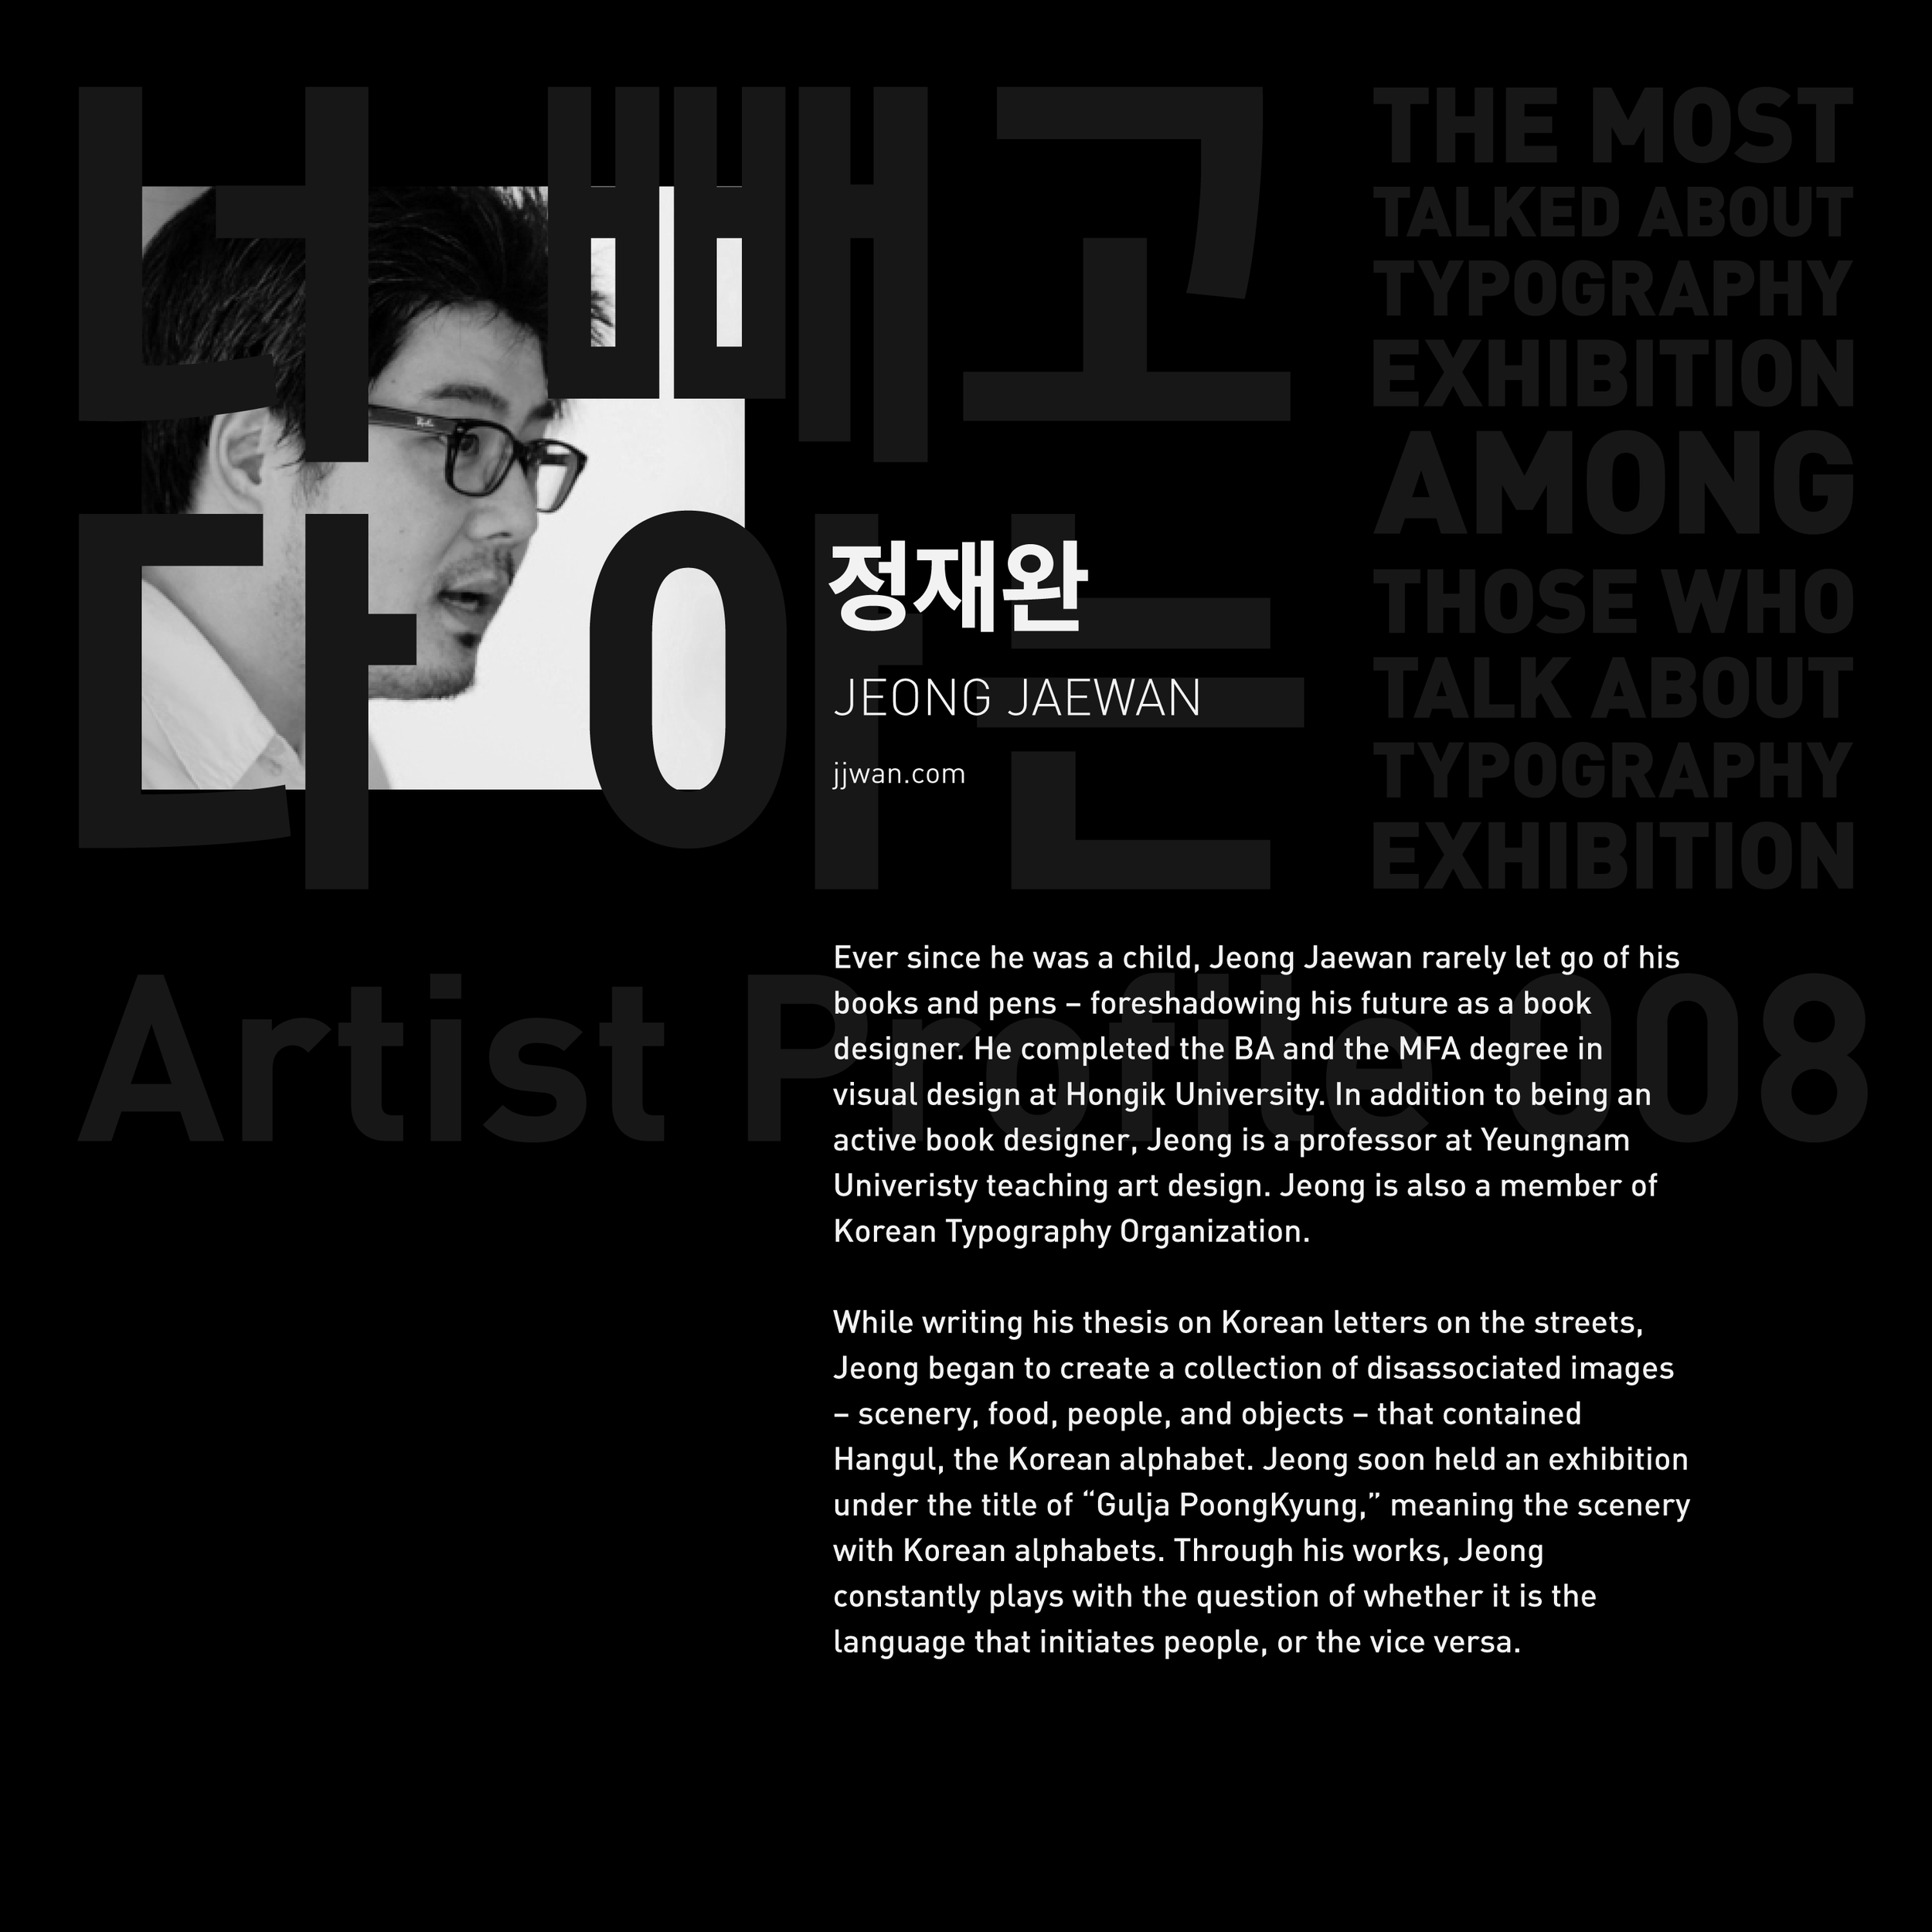 KoreanTypeExhibit_ArtistProfile_V2-08.png